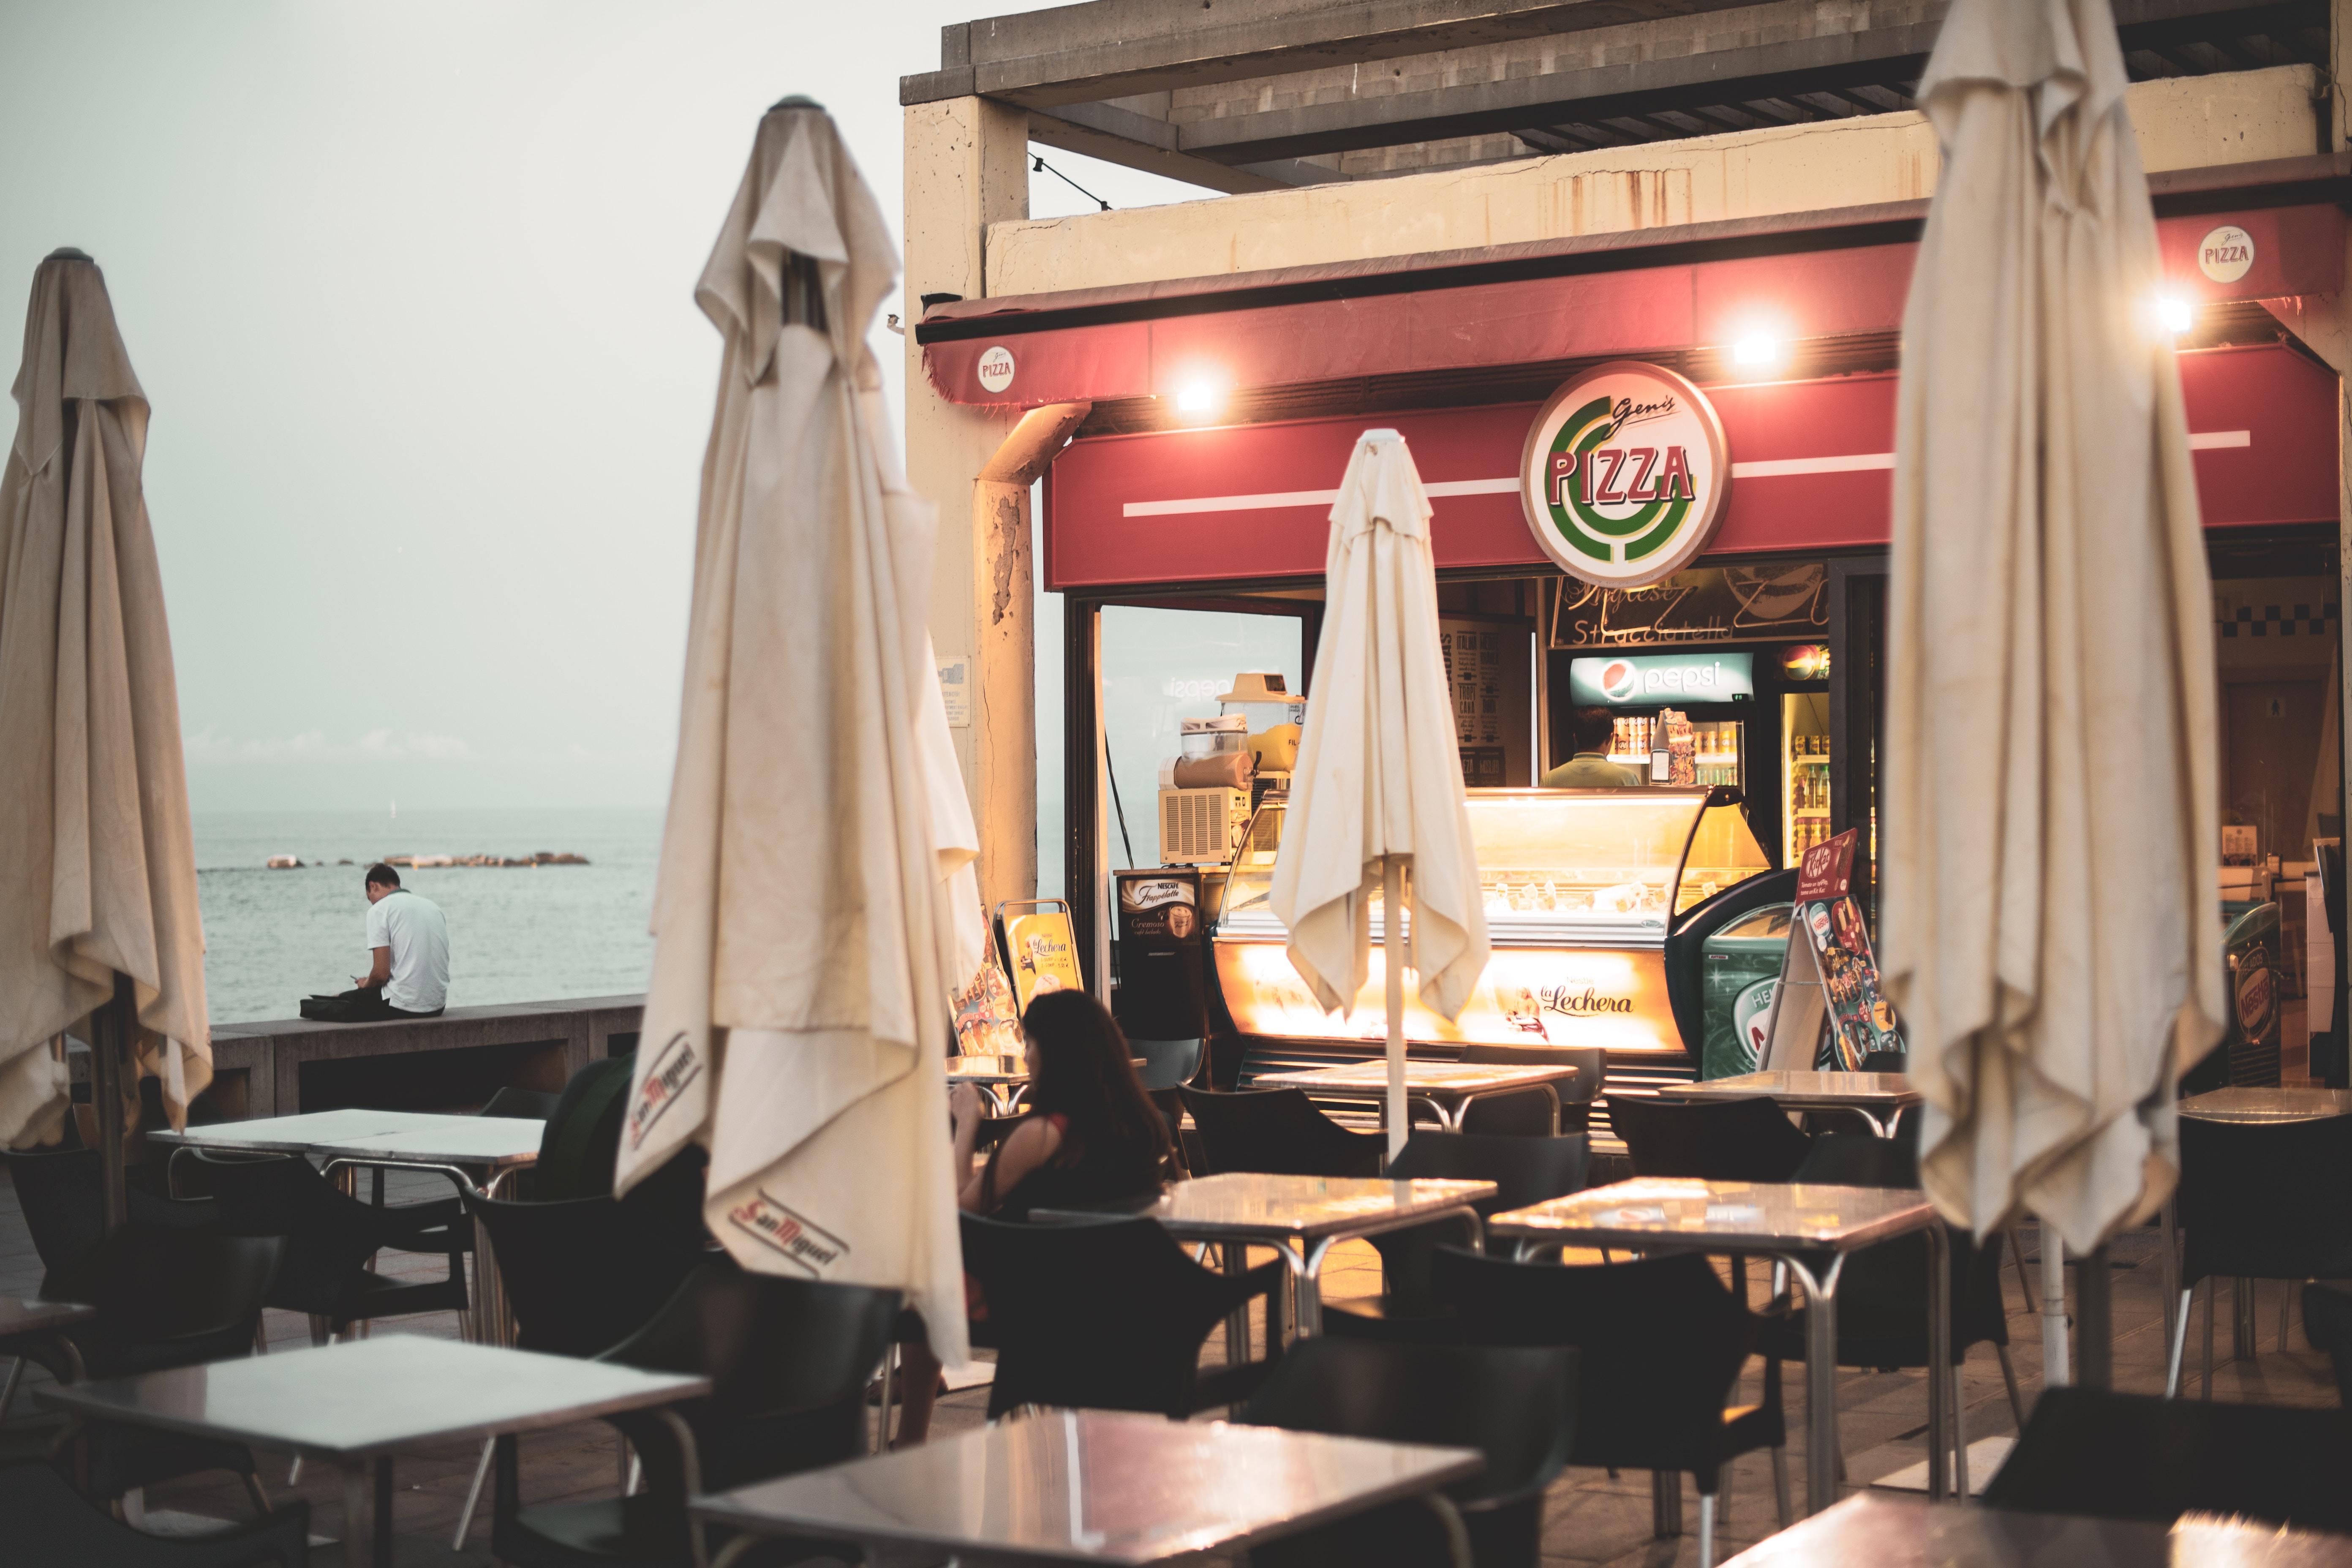 white dining tables near food establishment